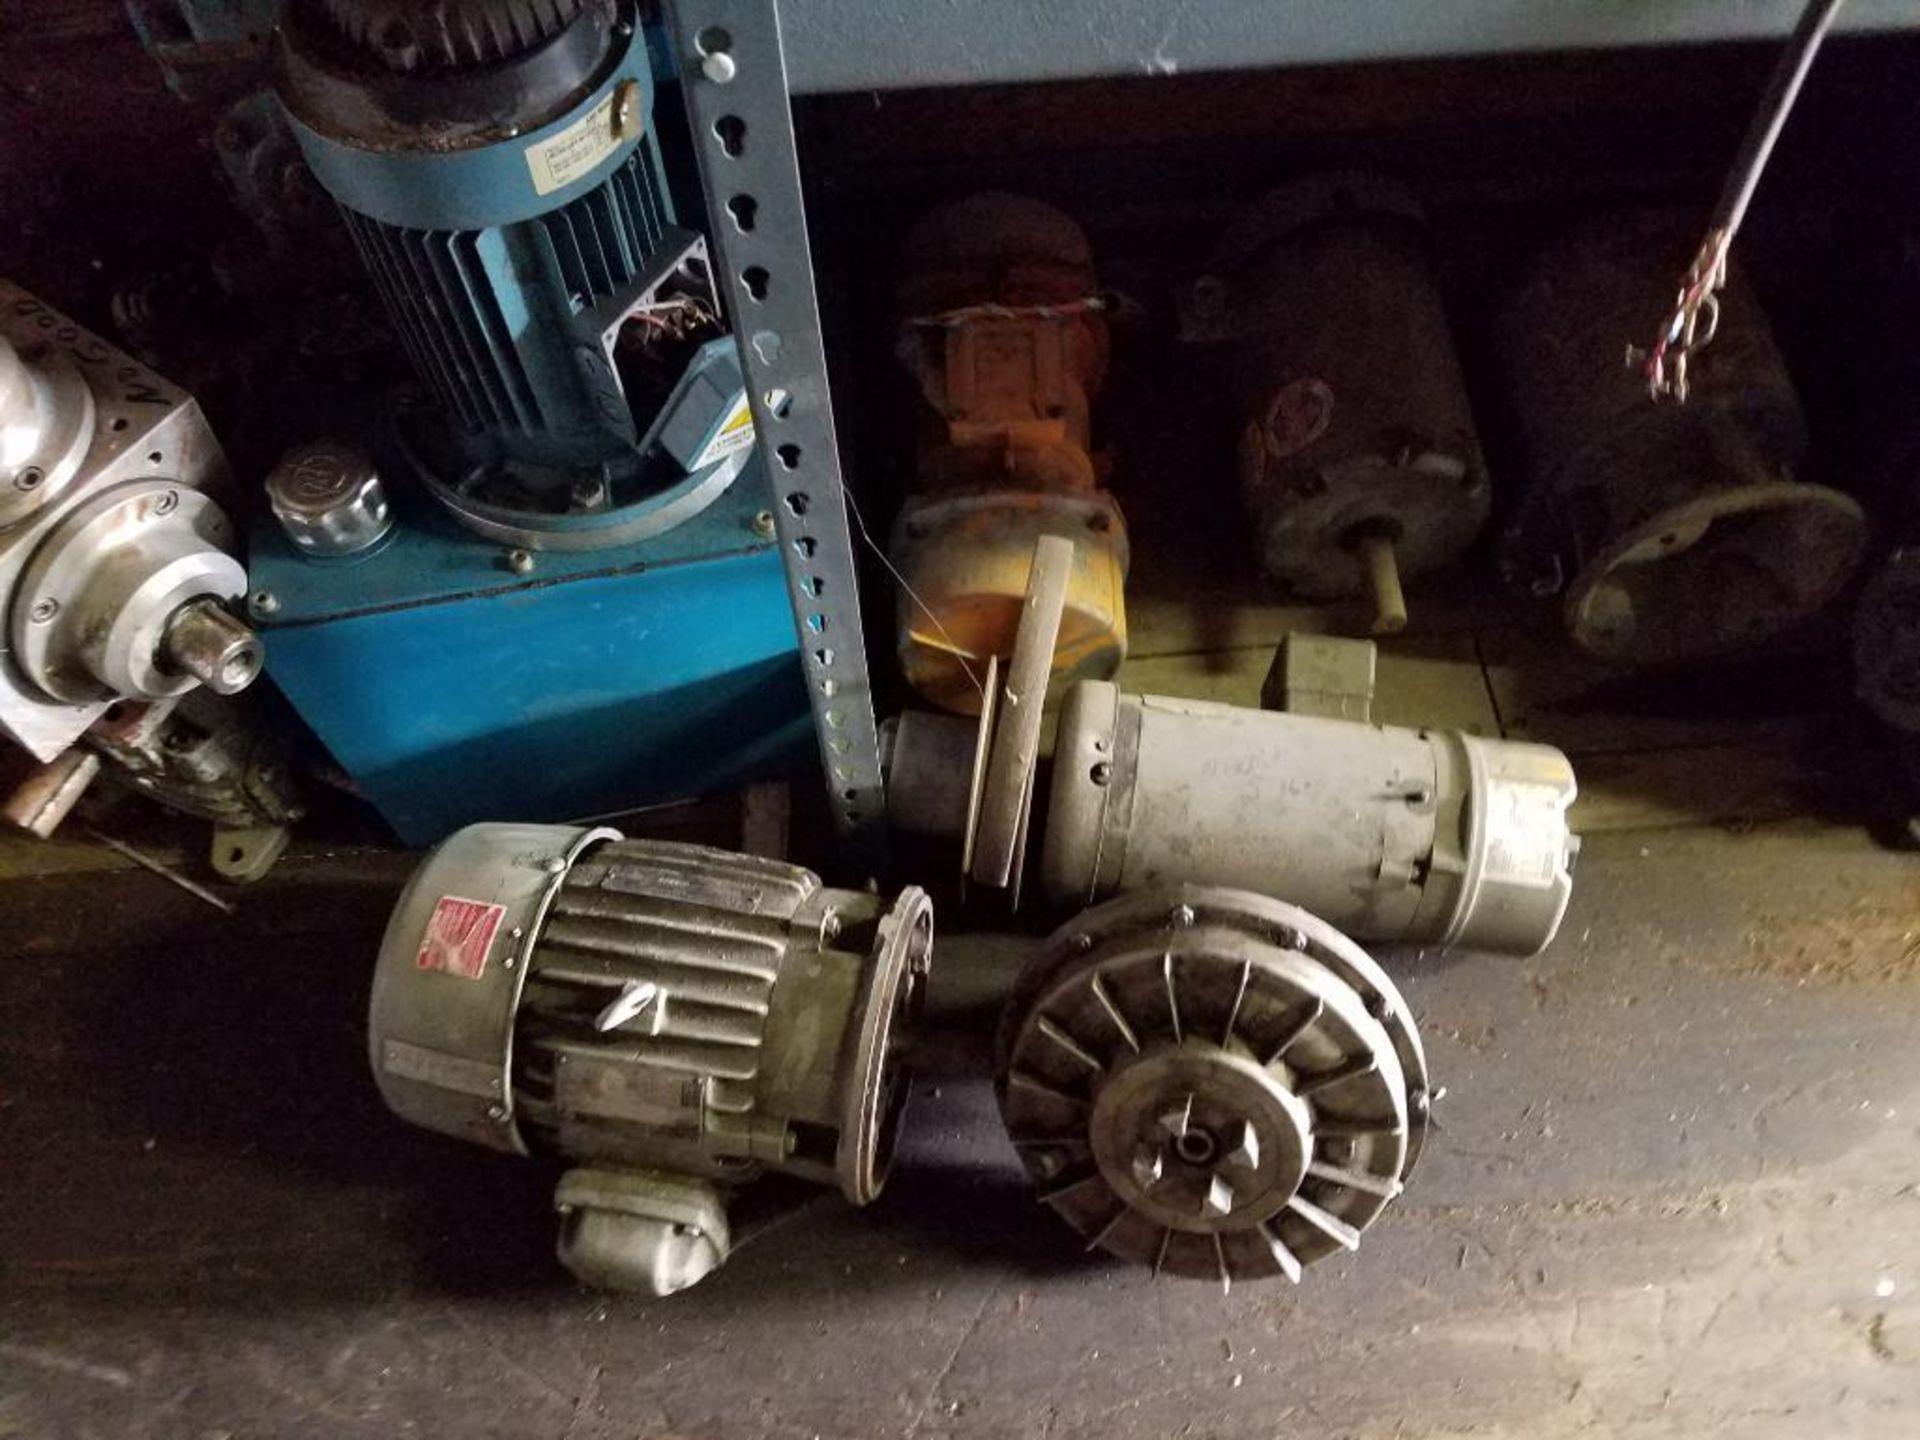 various motors and drives - Image 6 of 10